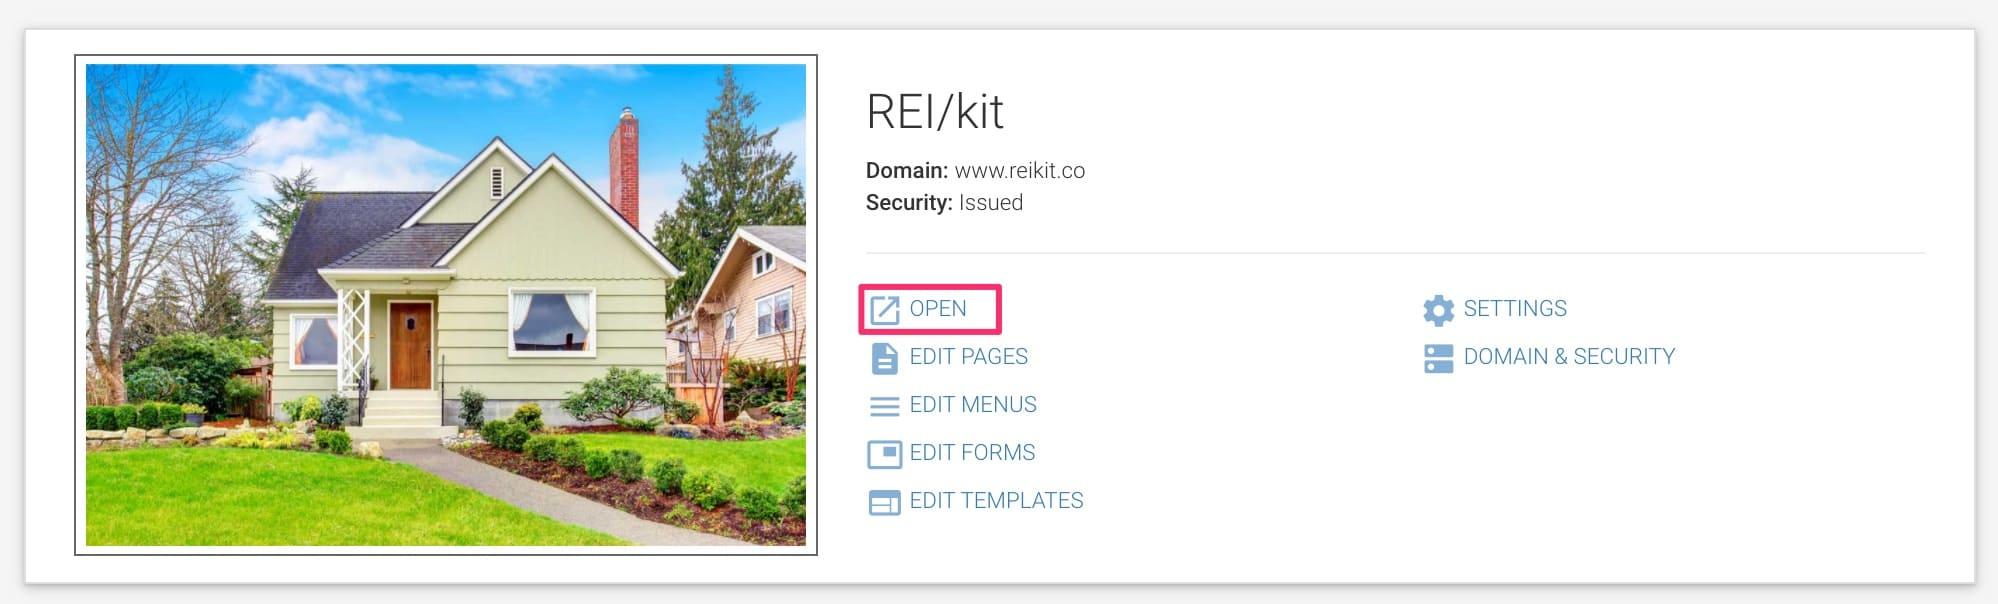 Website settings screen to open REIkit website url